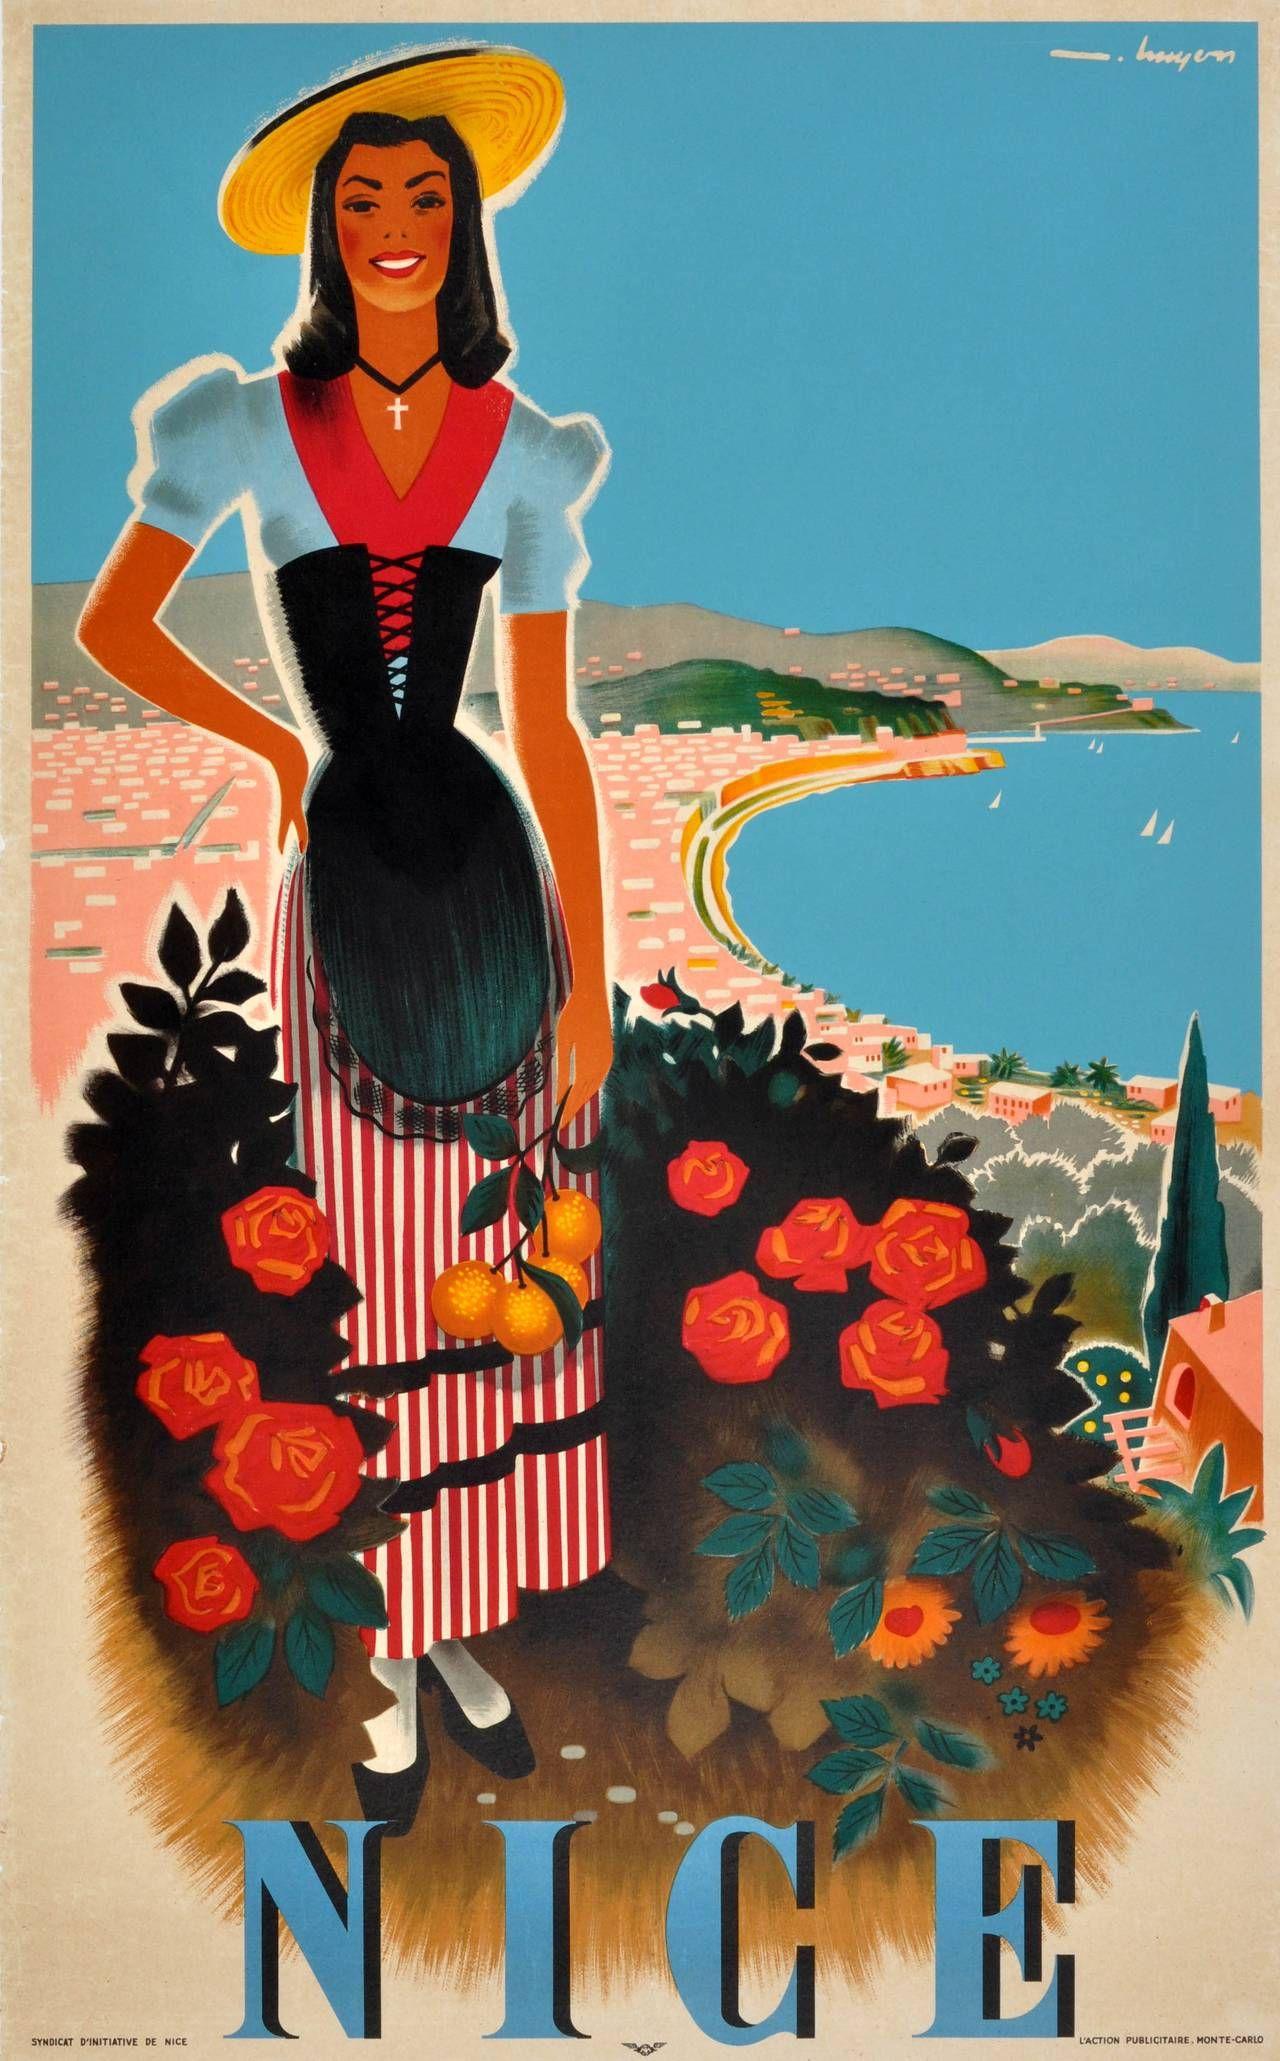 Poster design 1950 - Original Vintage 1950s Travel Poster Nice Cote D Azur French Riviera France